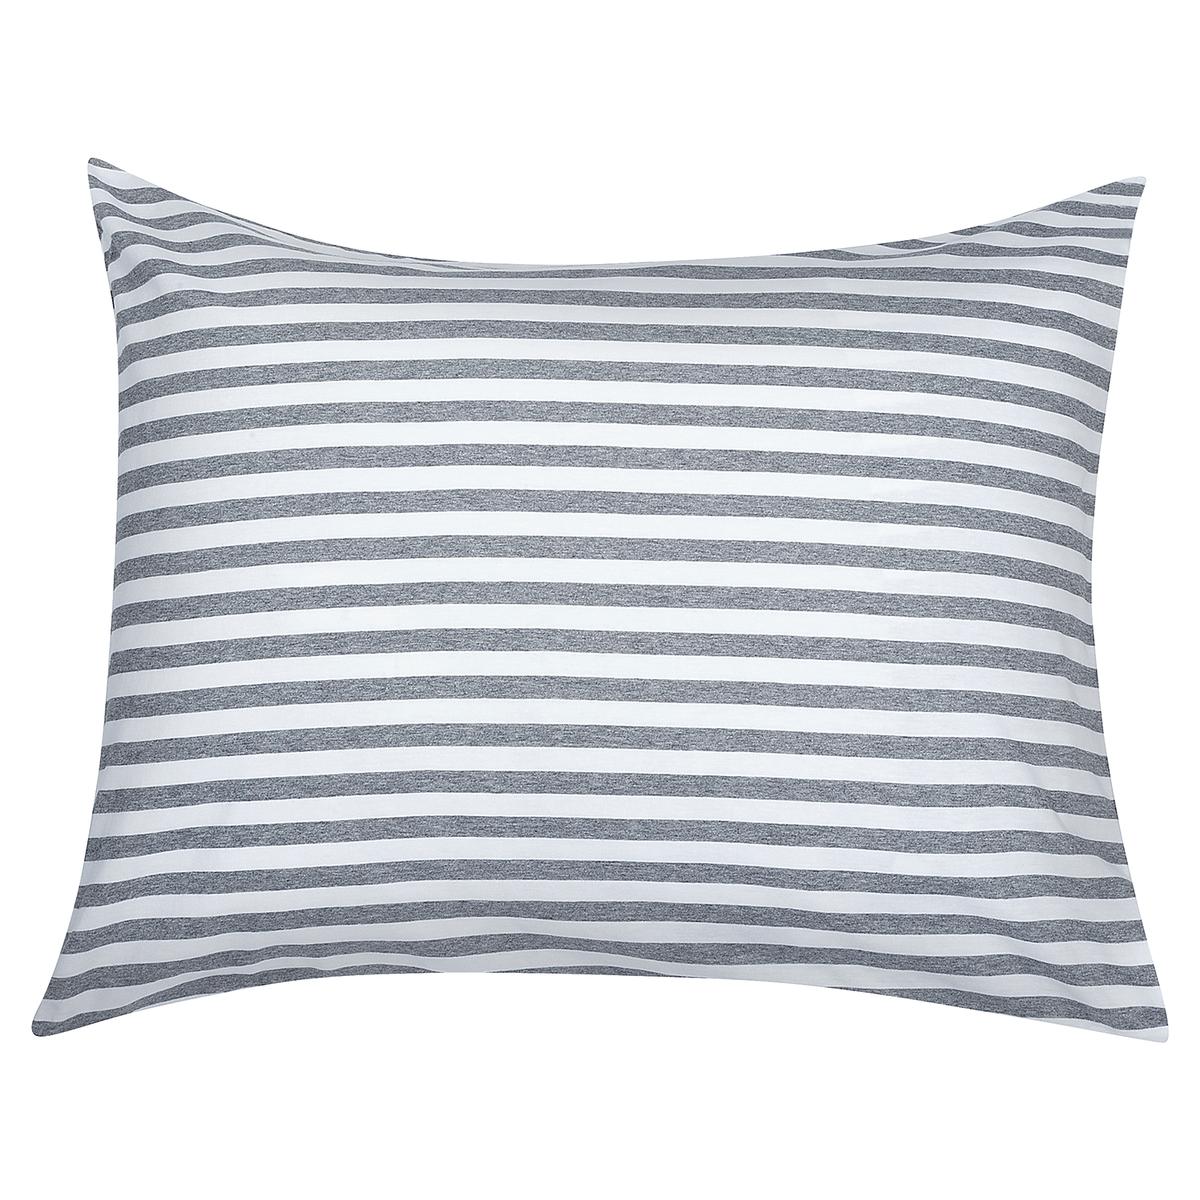 Marimekko Tasaraita Pillowcase, Grey - White